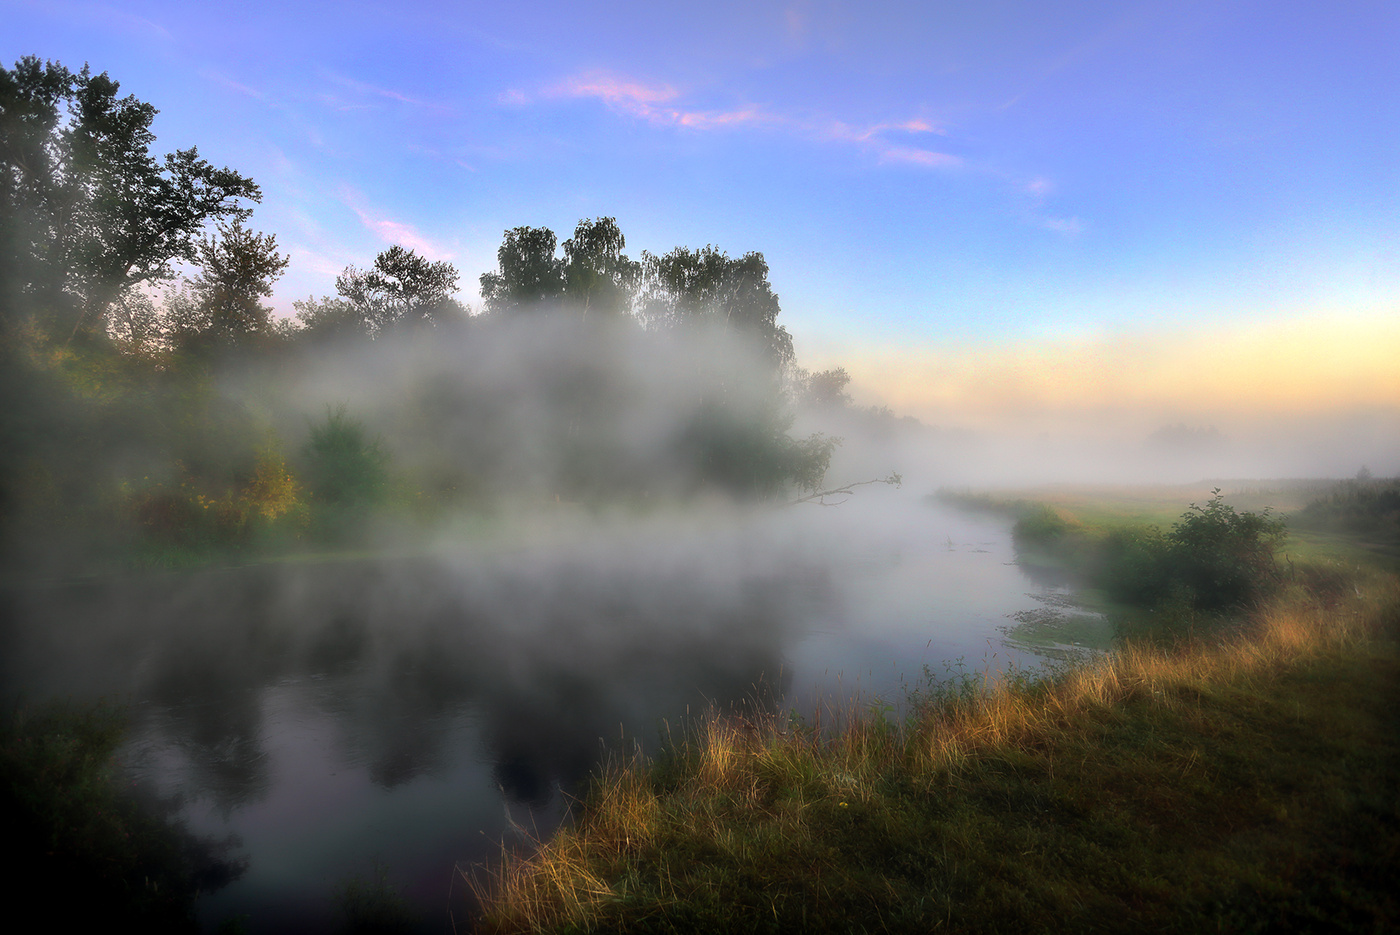 картинки туманы августа вечером